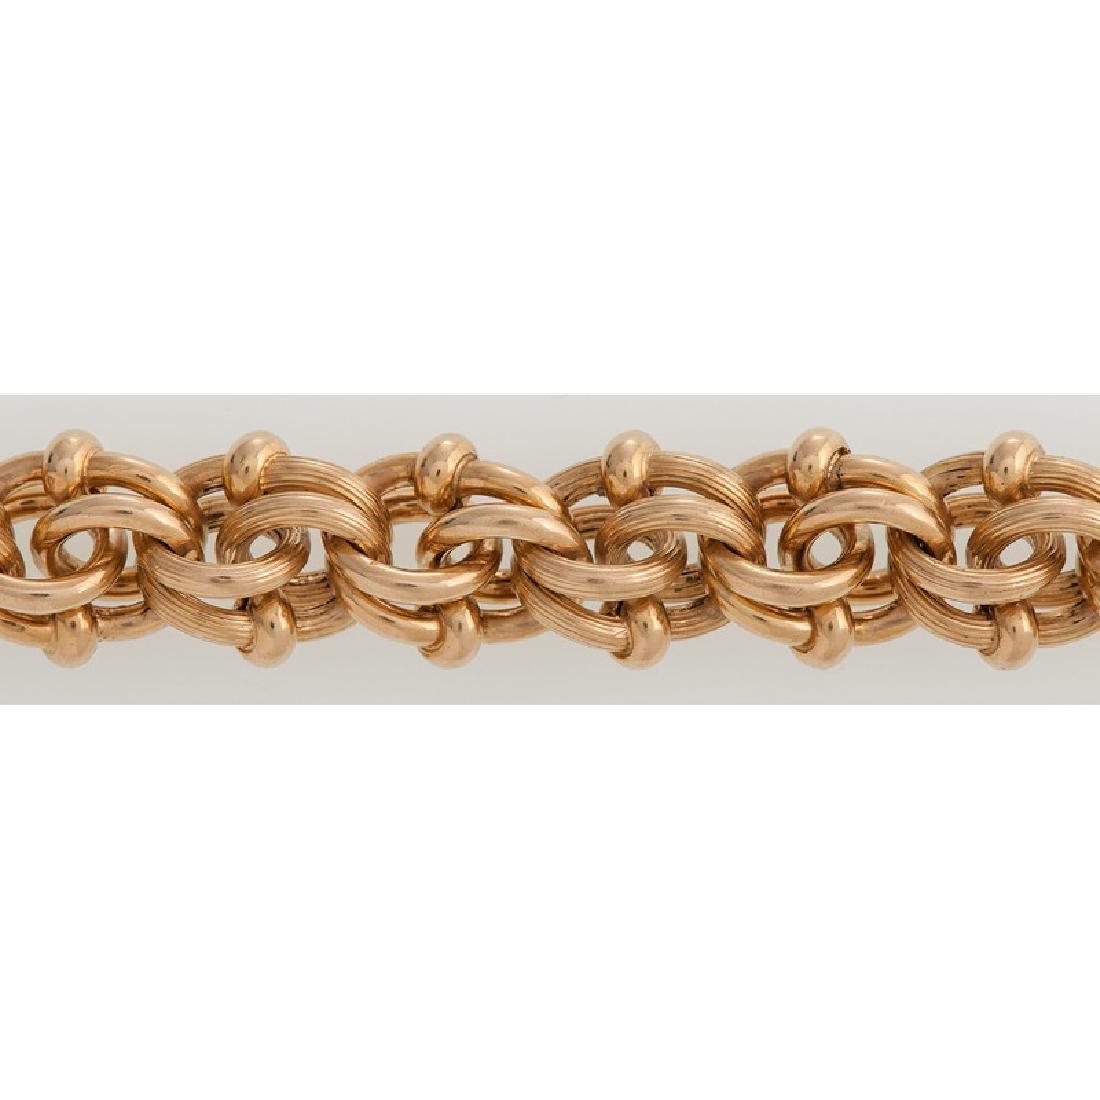 Tiffany & Co. 18 Karat Yellow Gold Bracelet - 2